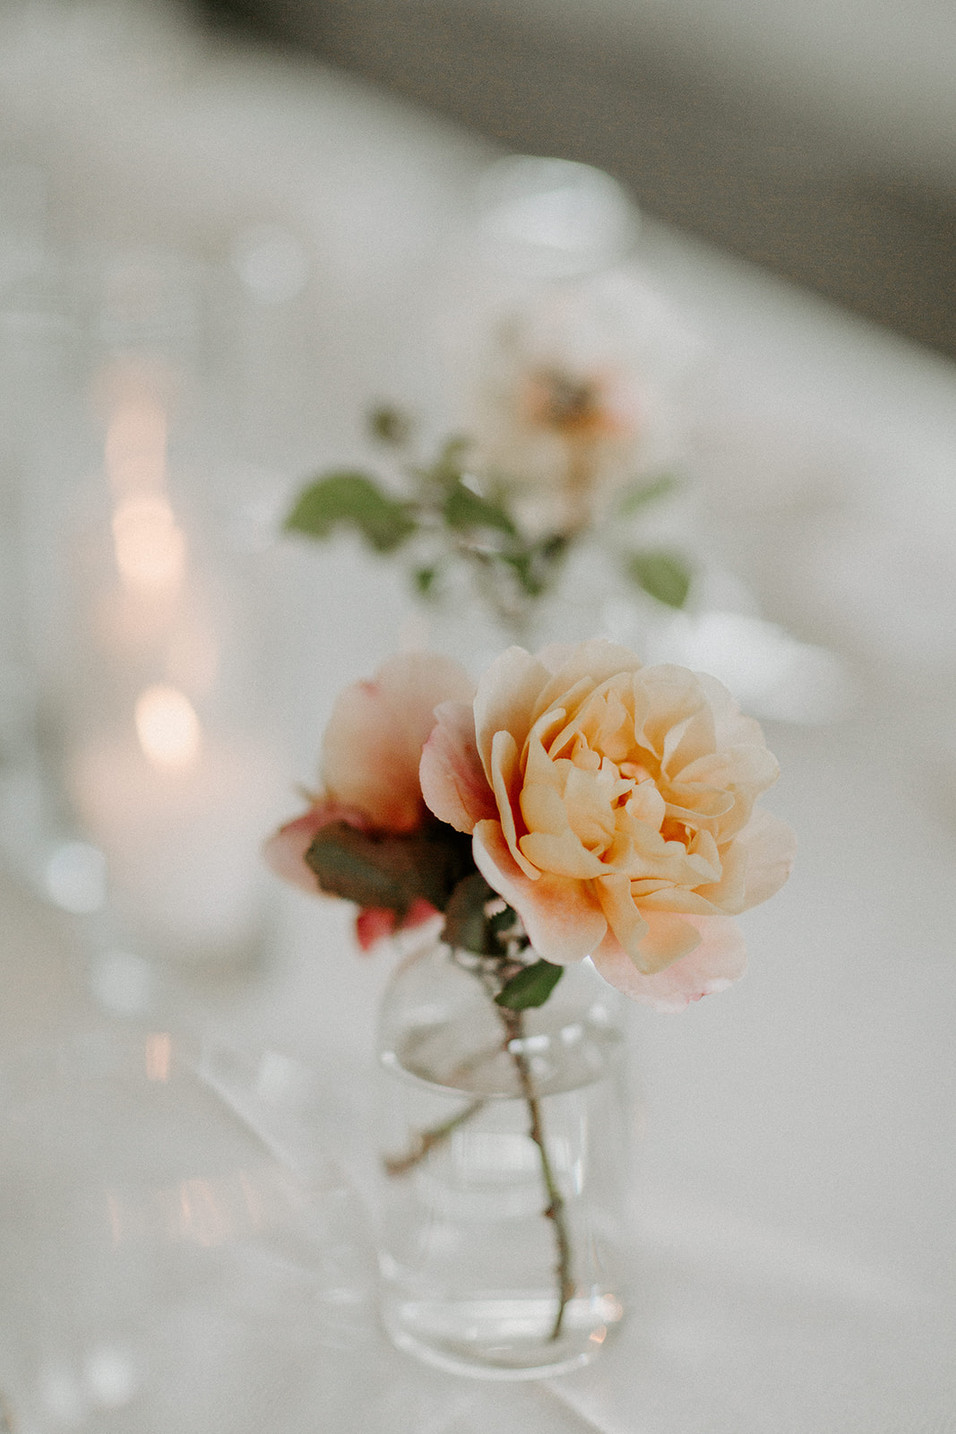 charmaine_ben_wedding_0510_websize.jpg